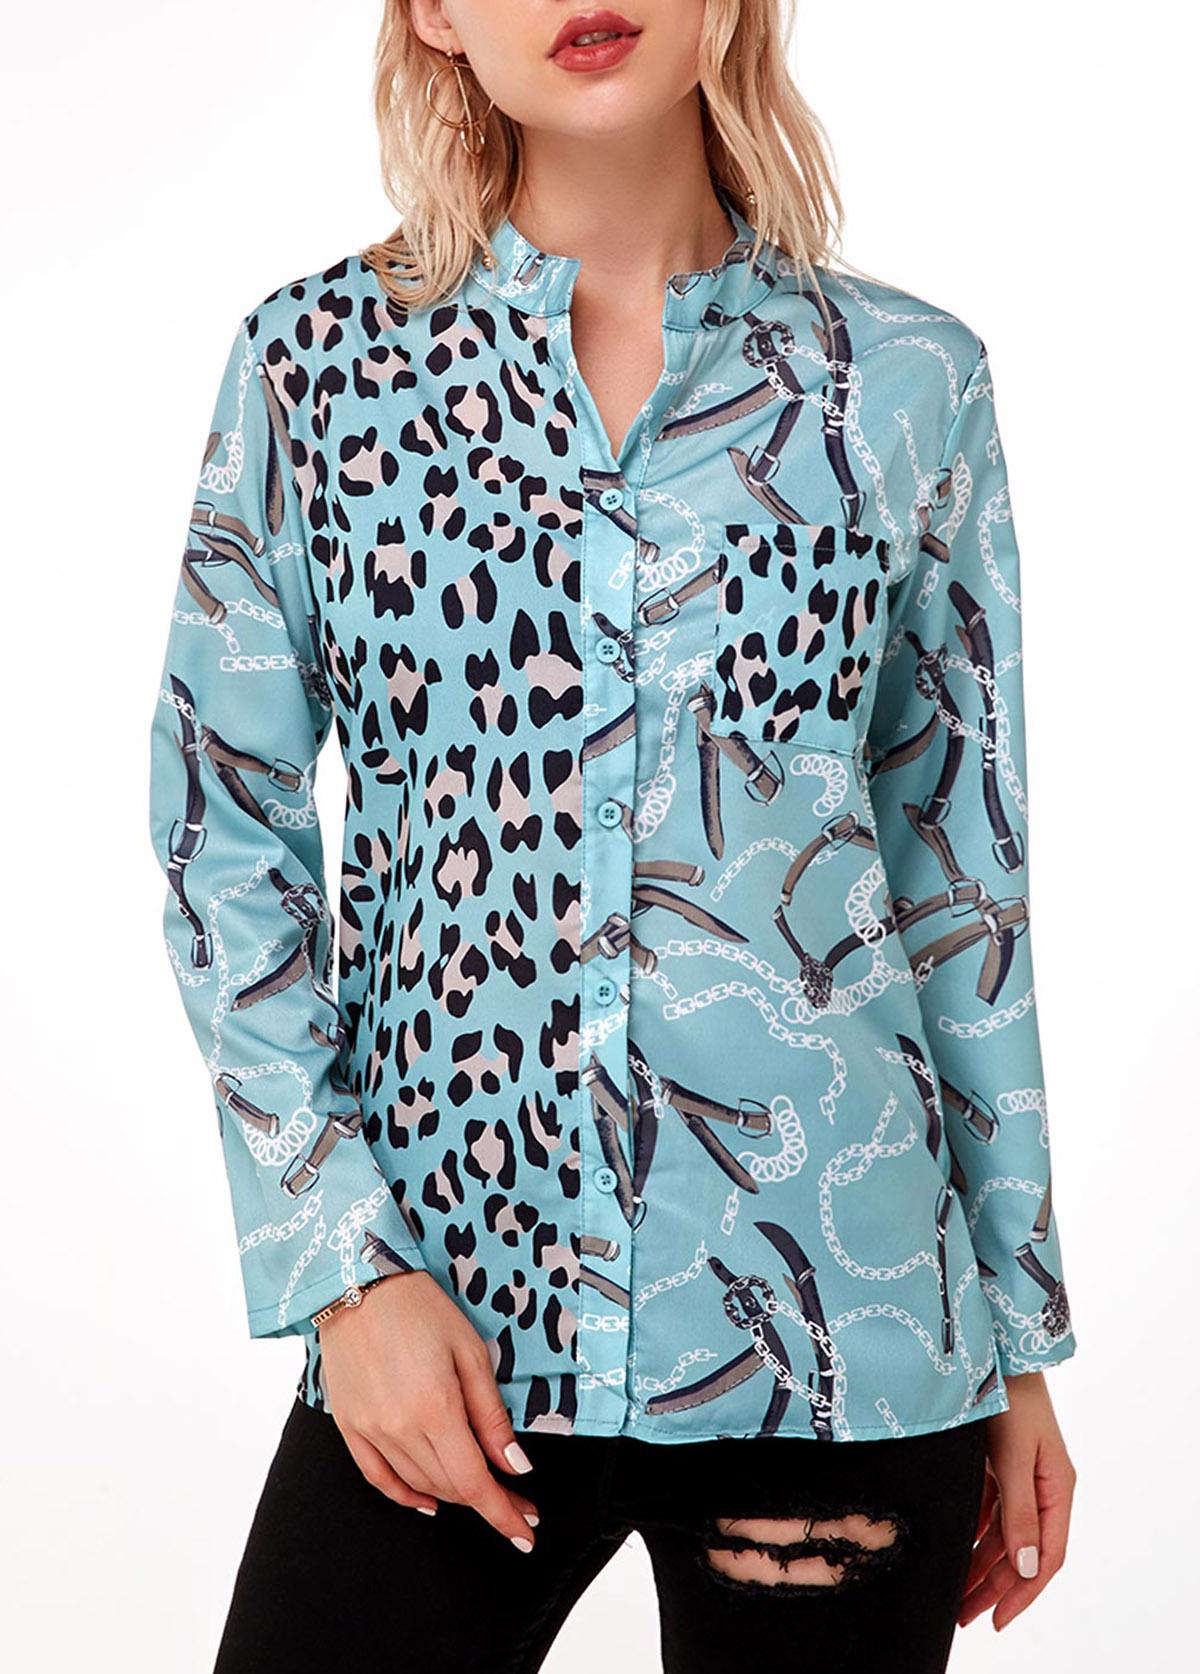 Leopard Button Up Long Sleeve Blouse